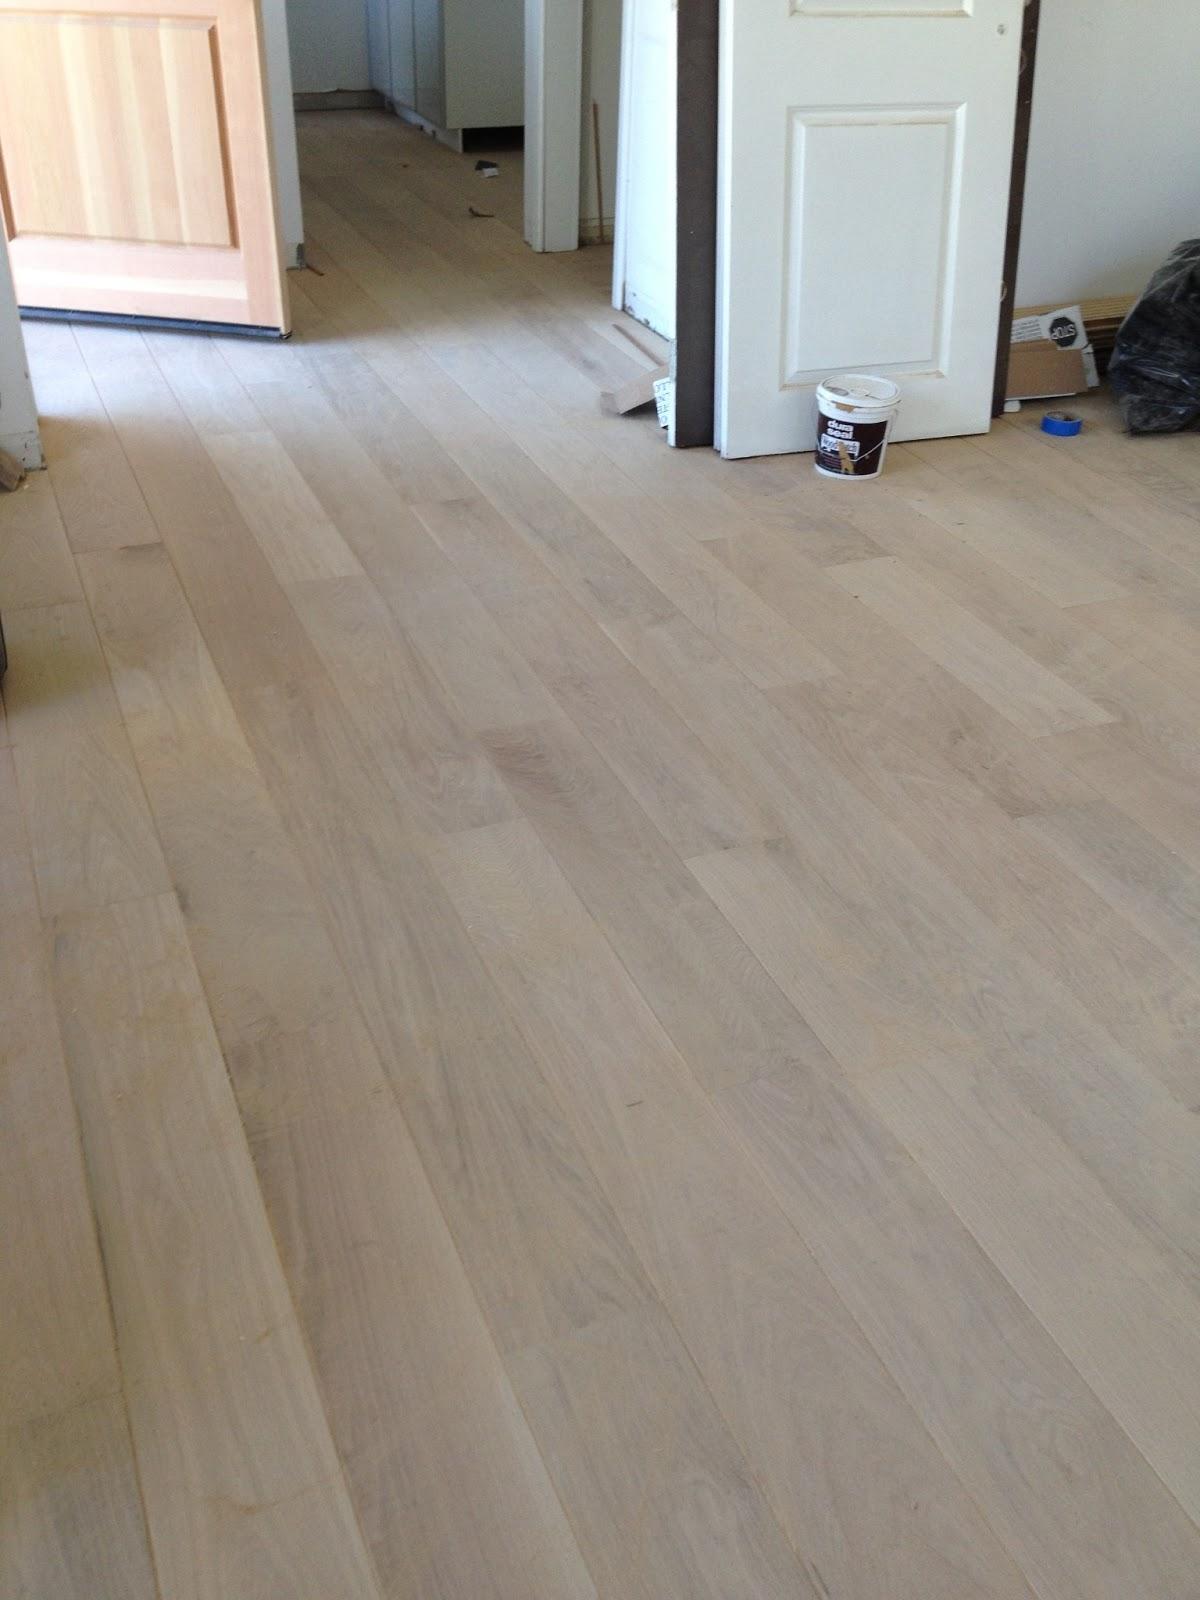 Oak Wood Floors Accent Gray Walls Highlighting A White: Nbaynadamas Furniture And Interior